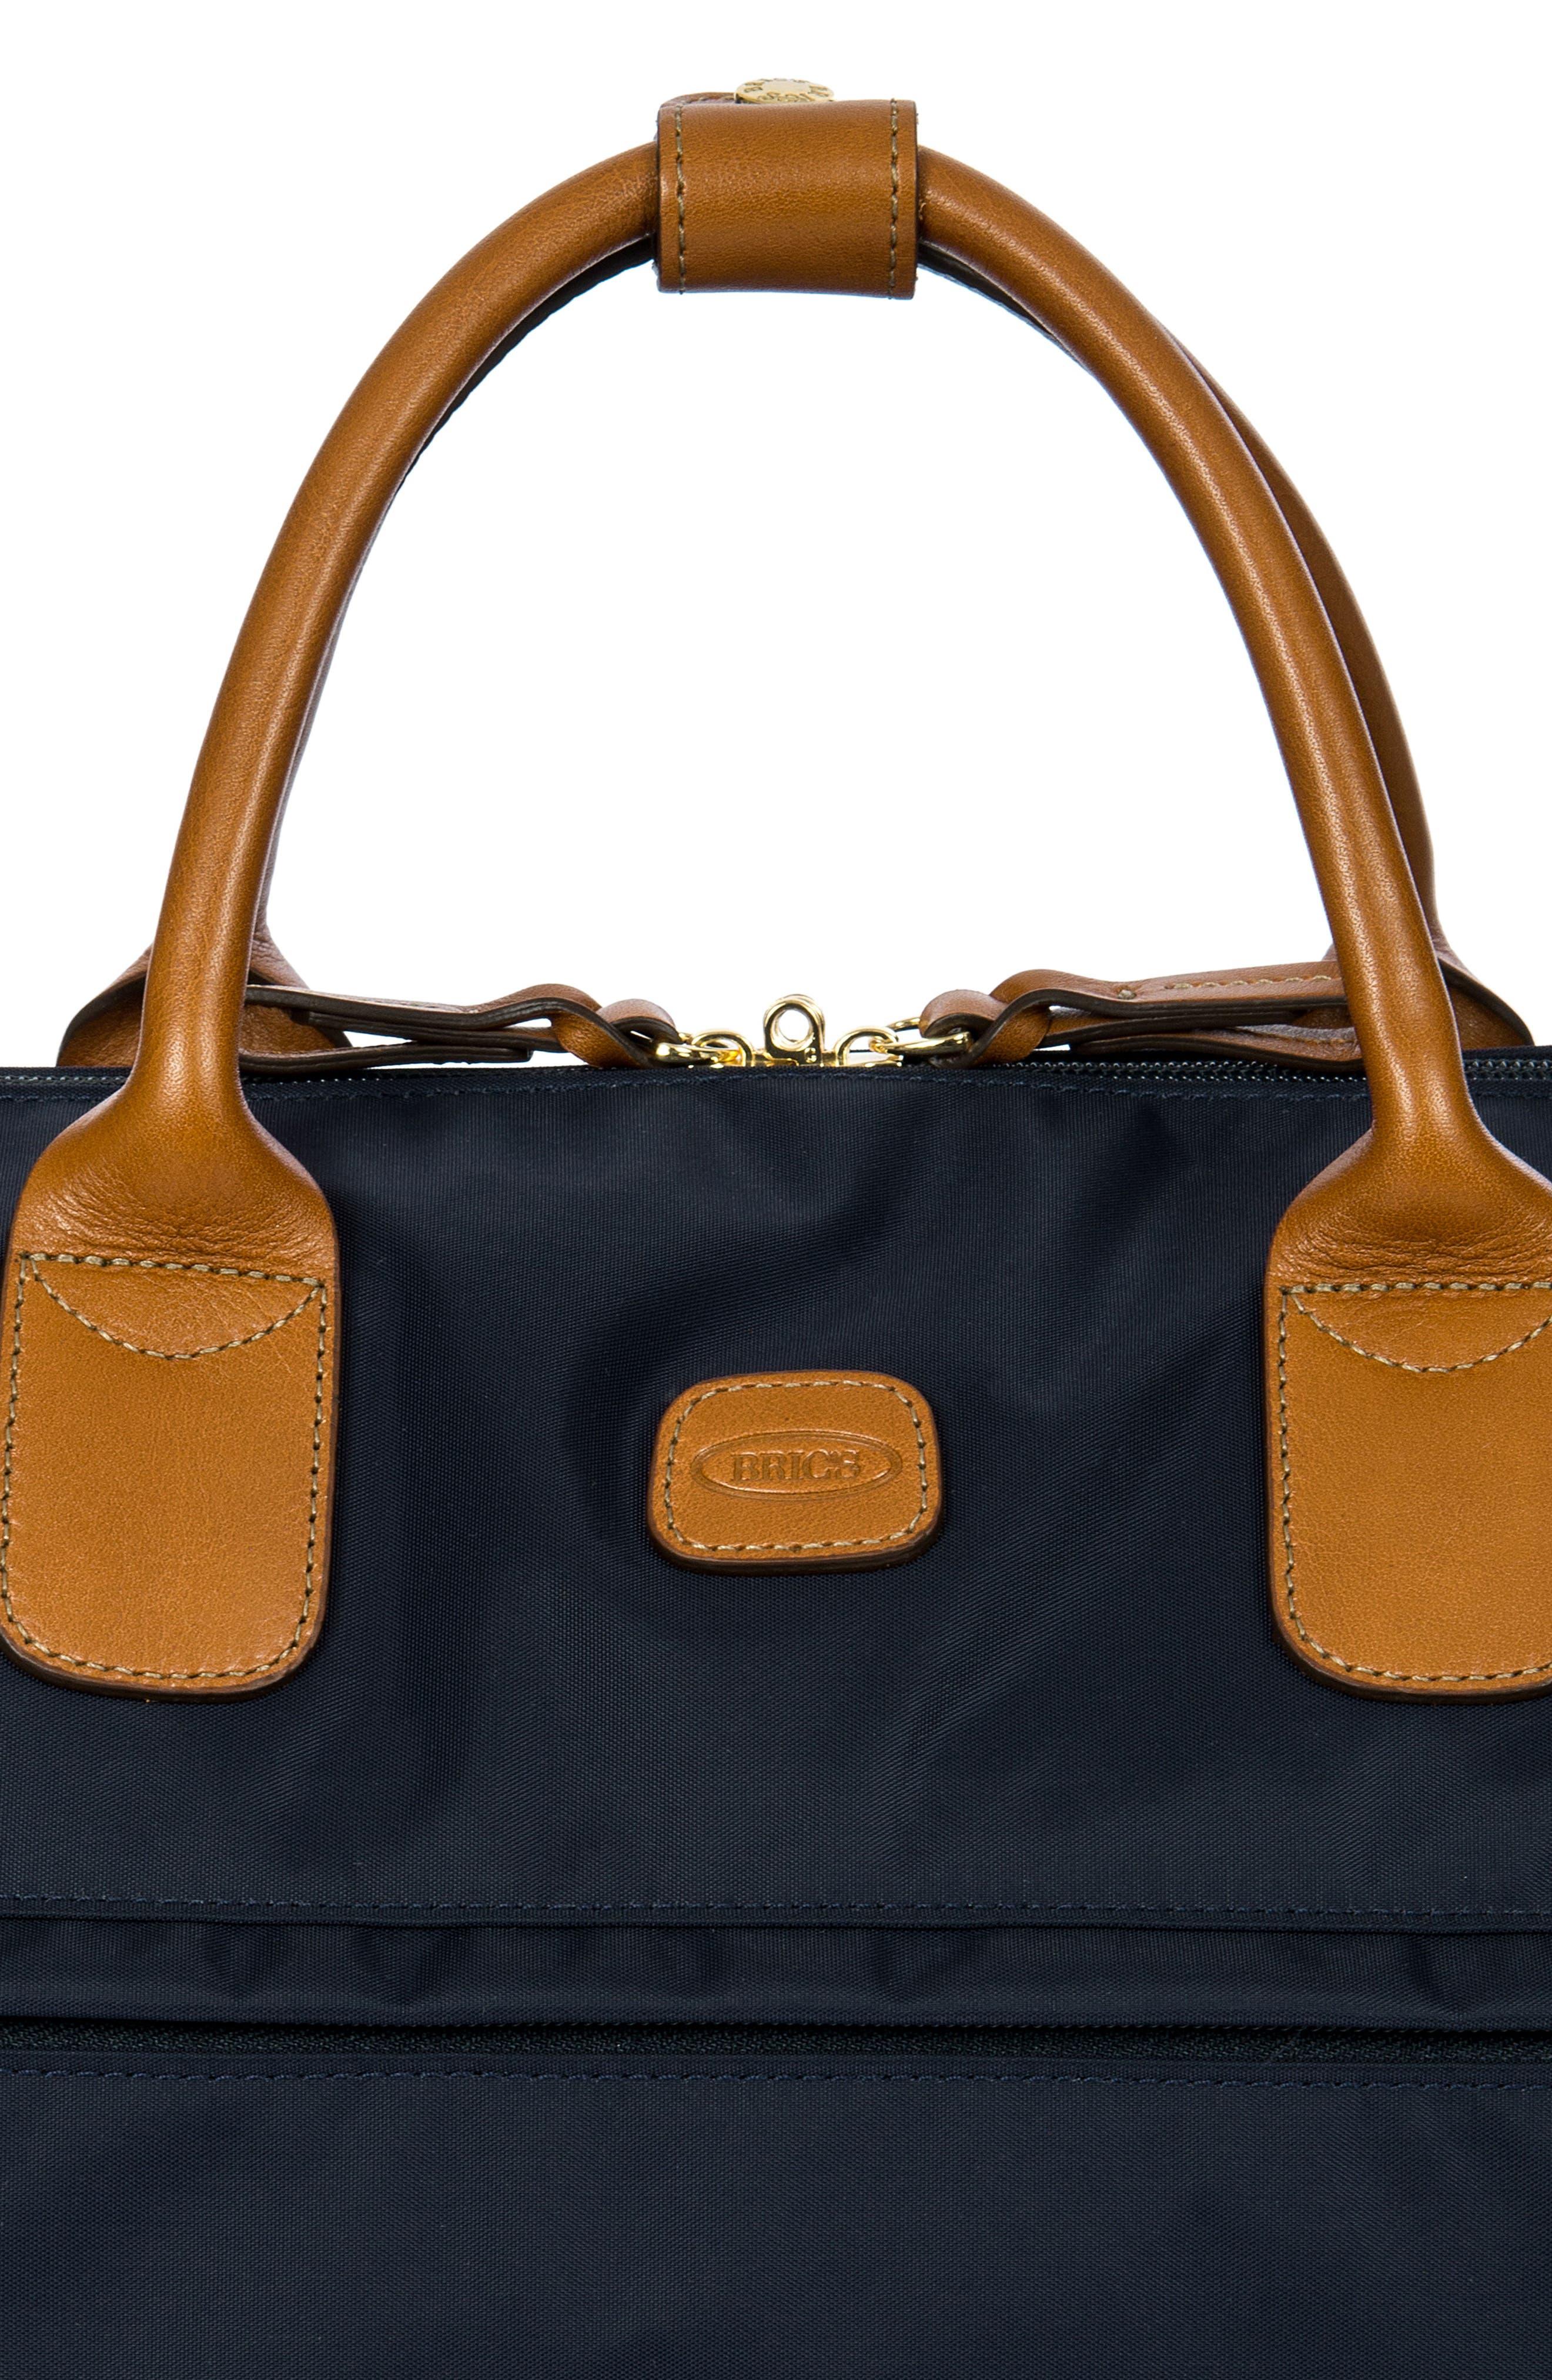 X-Bag Boarding 22-Inch Duffel Bag,                             Alternate thumbnail 5, color,                             NAVY